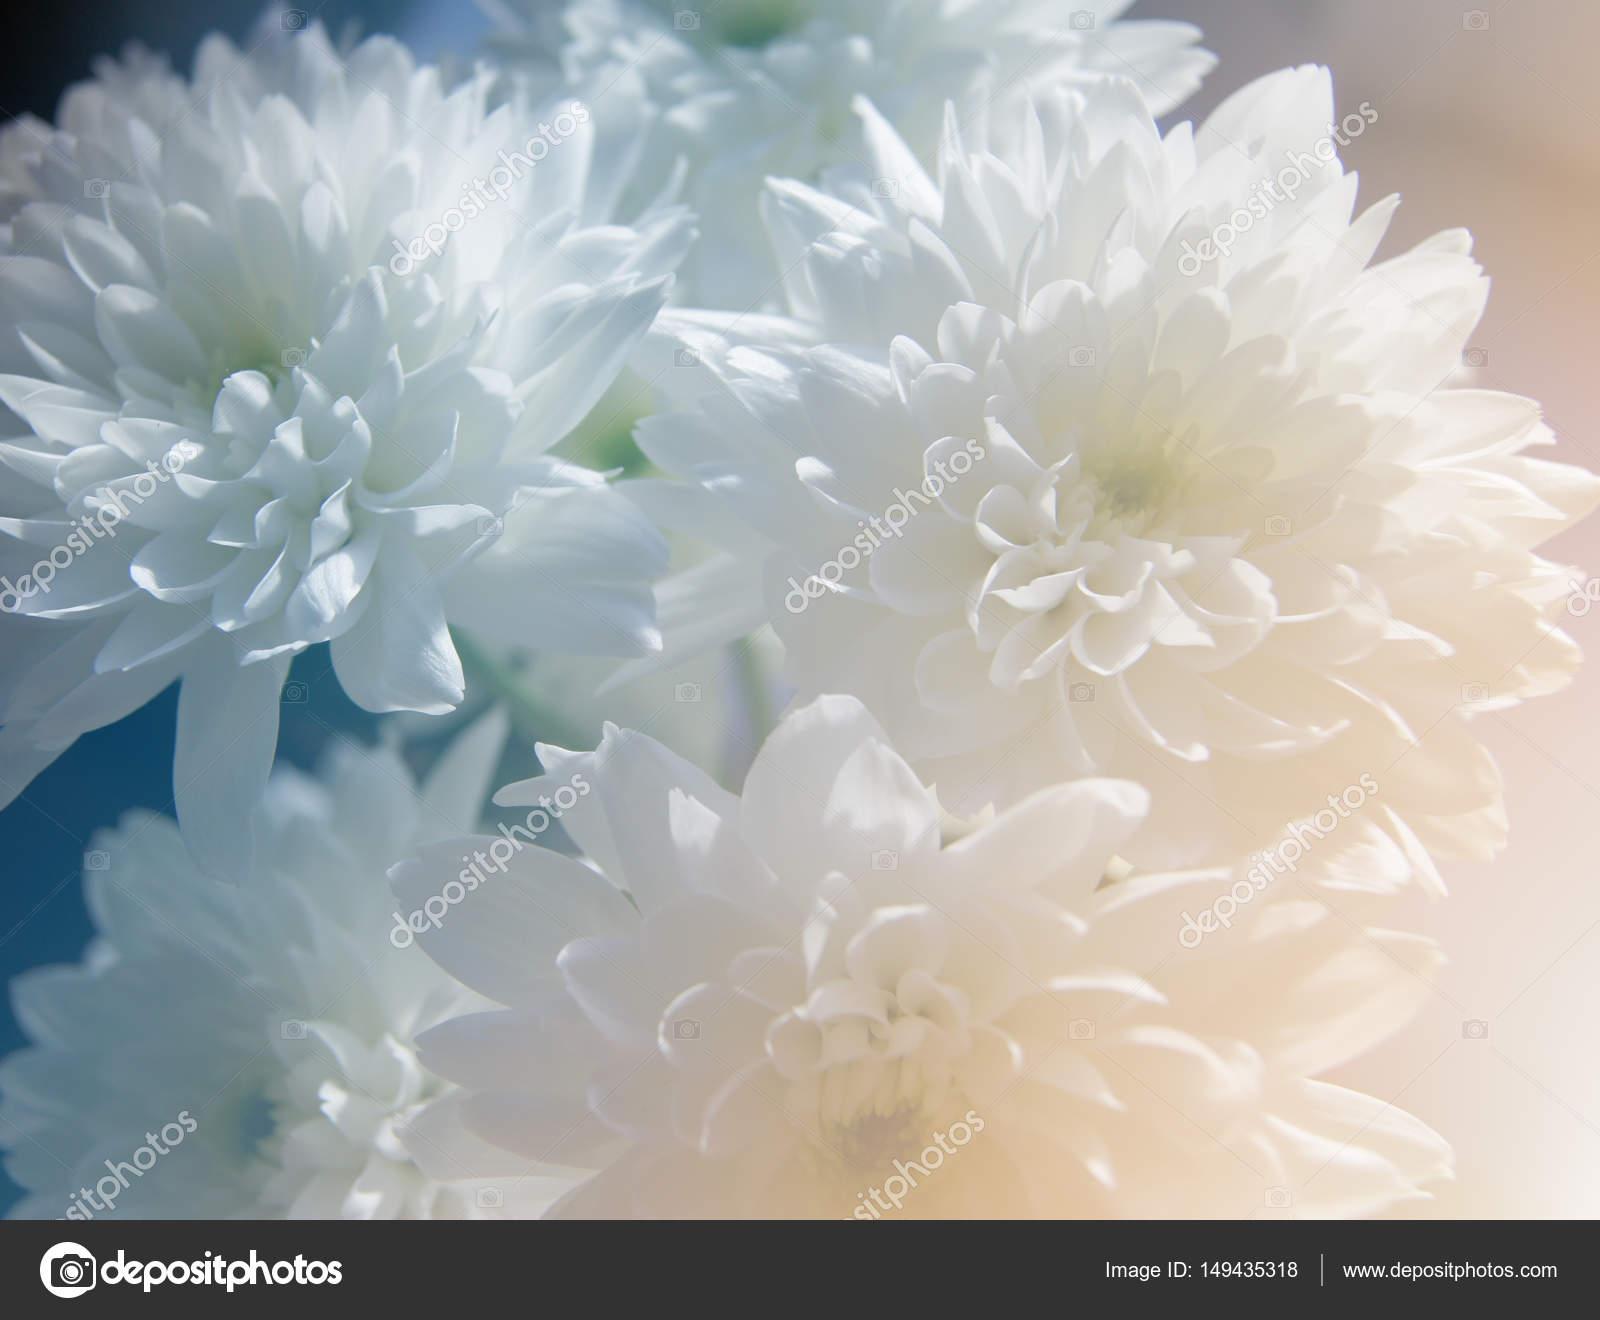 Маленький столик за углом - Том VII - Страница 31 Depositphotos_149435318-stock-photo-bouquet-of-chrysanthemums-flowers